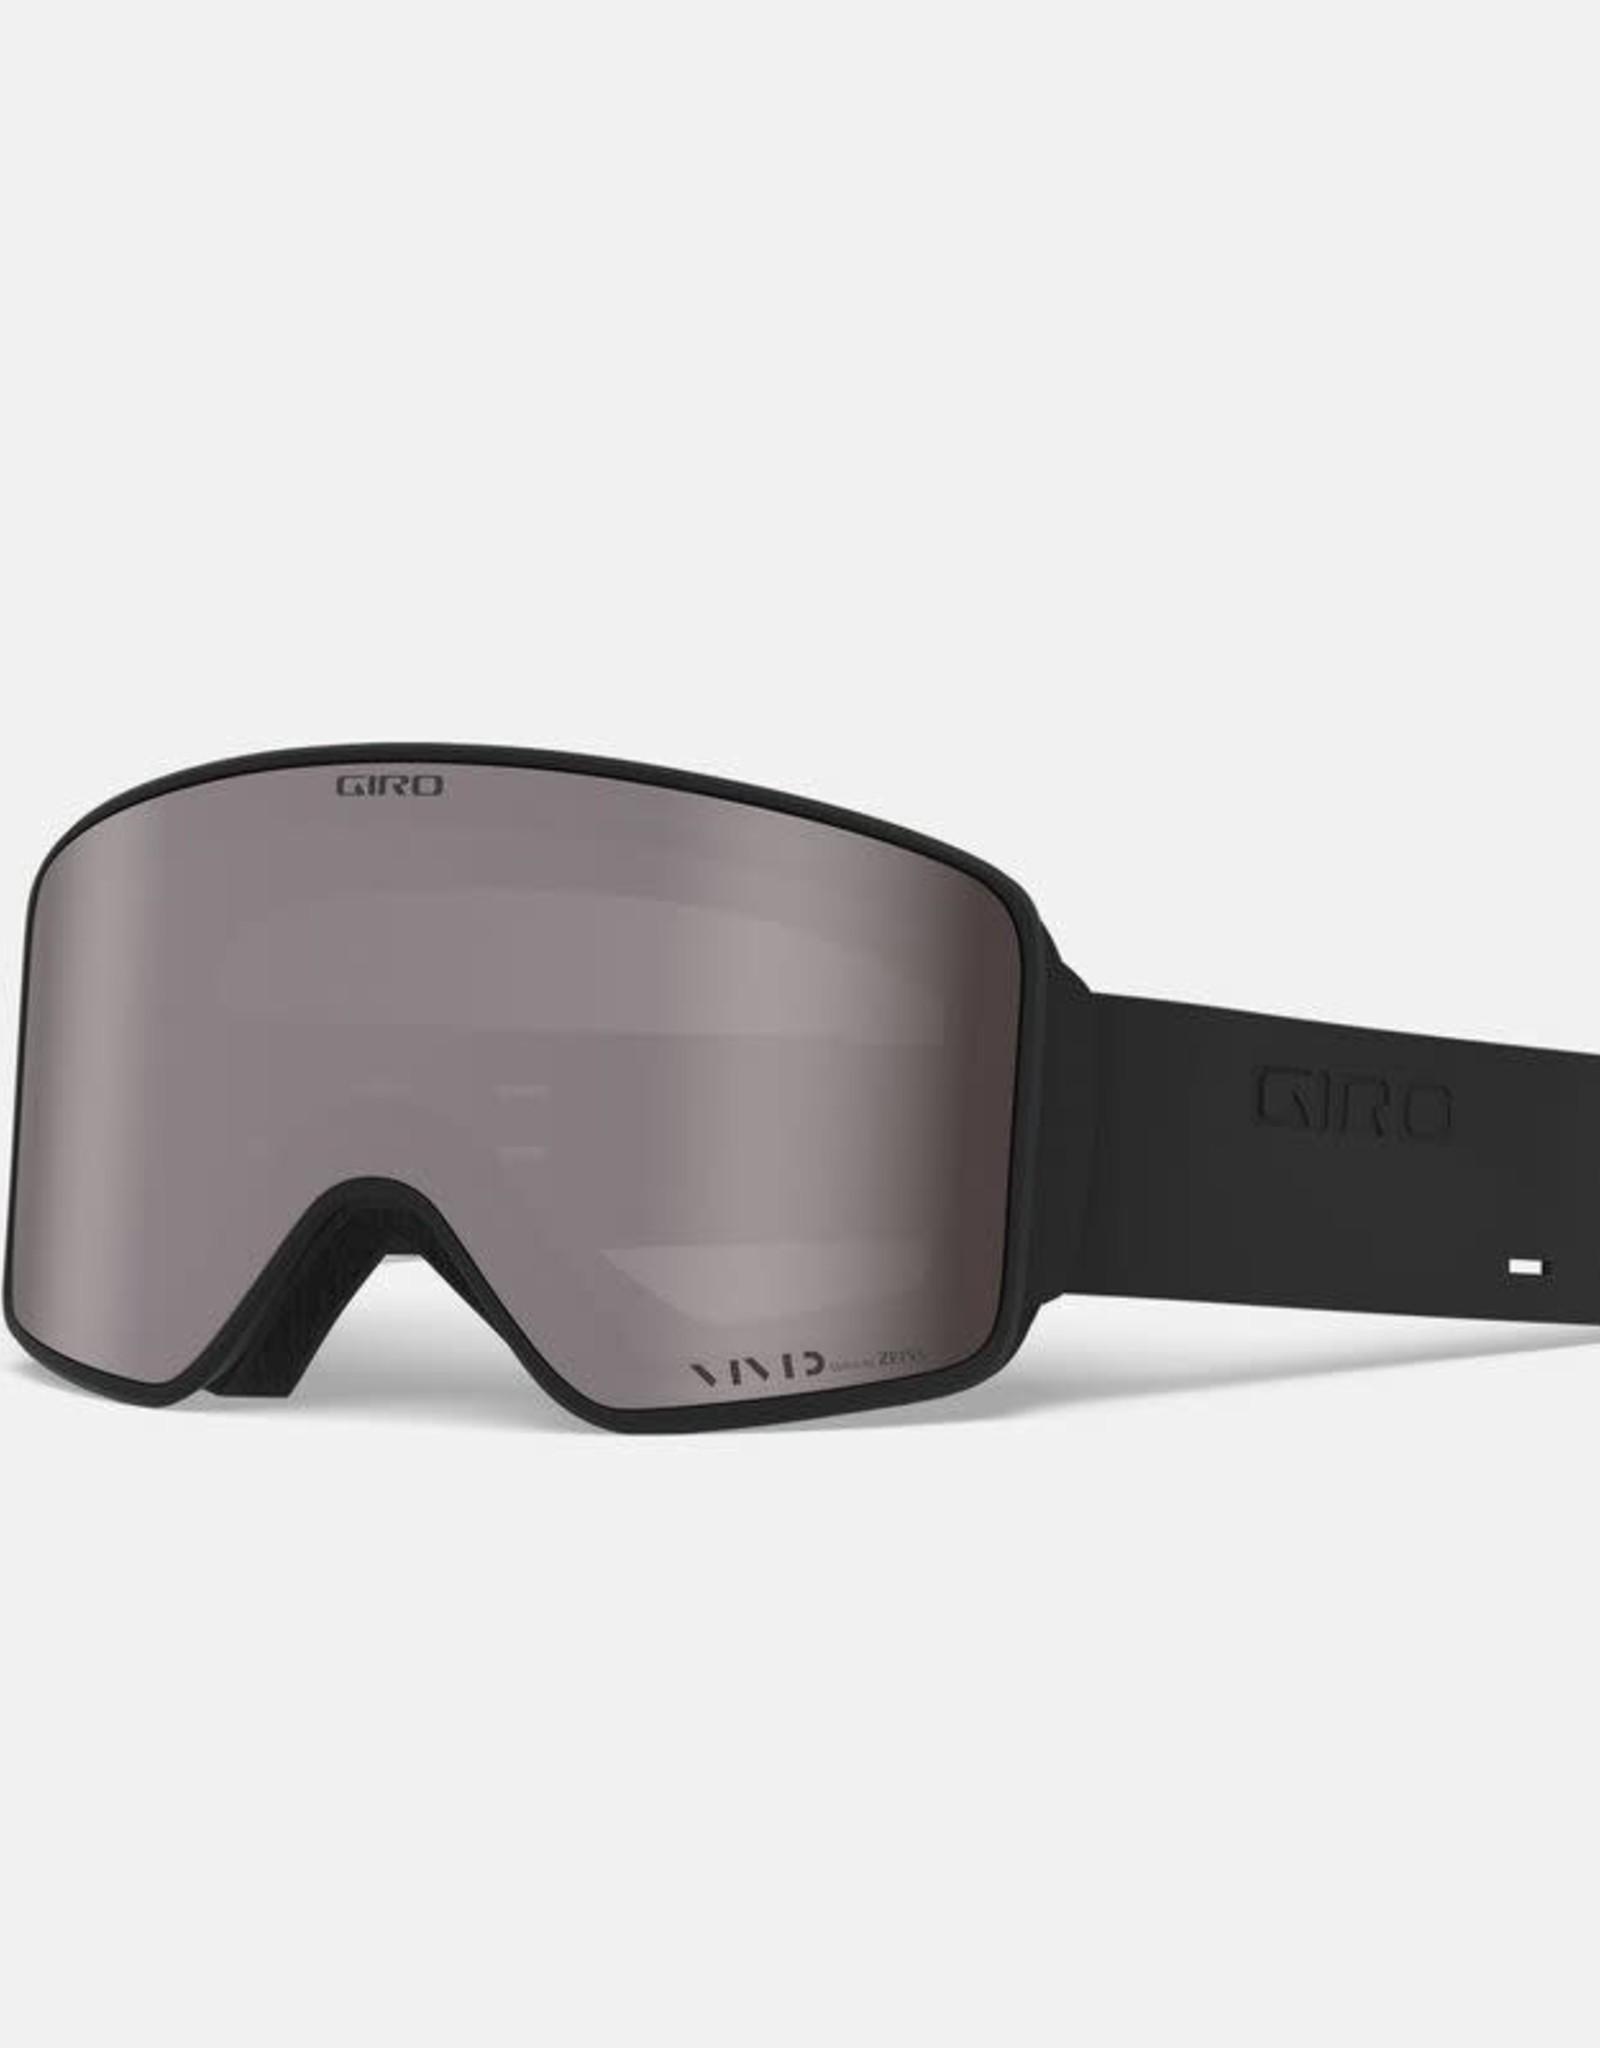 Giro - METHOD Goggle - Black Silicone w/ VIVID Onyx + Bonus Lens